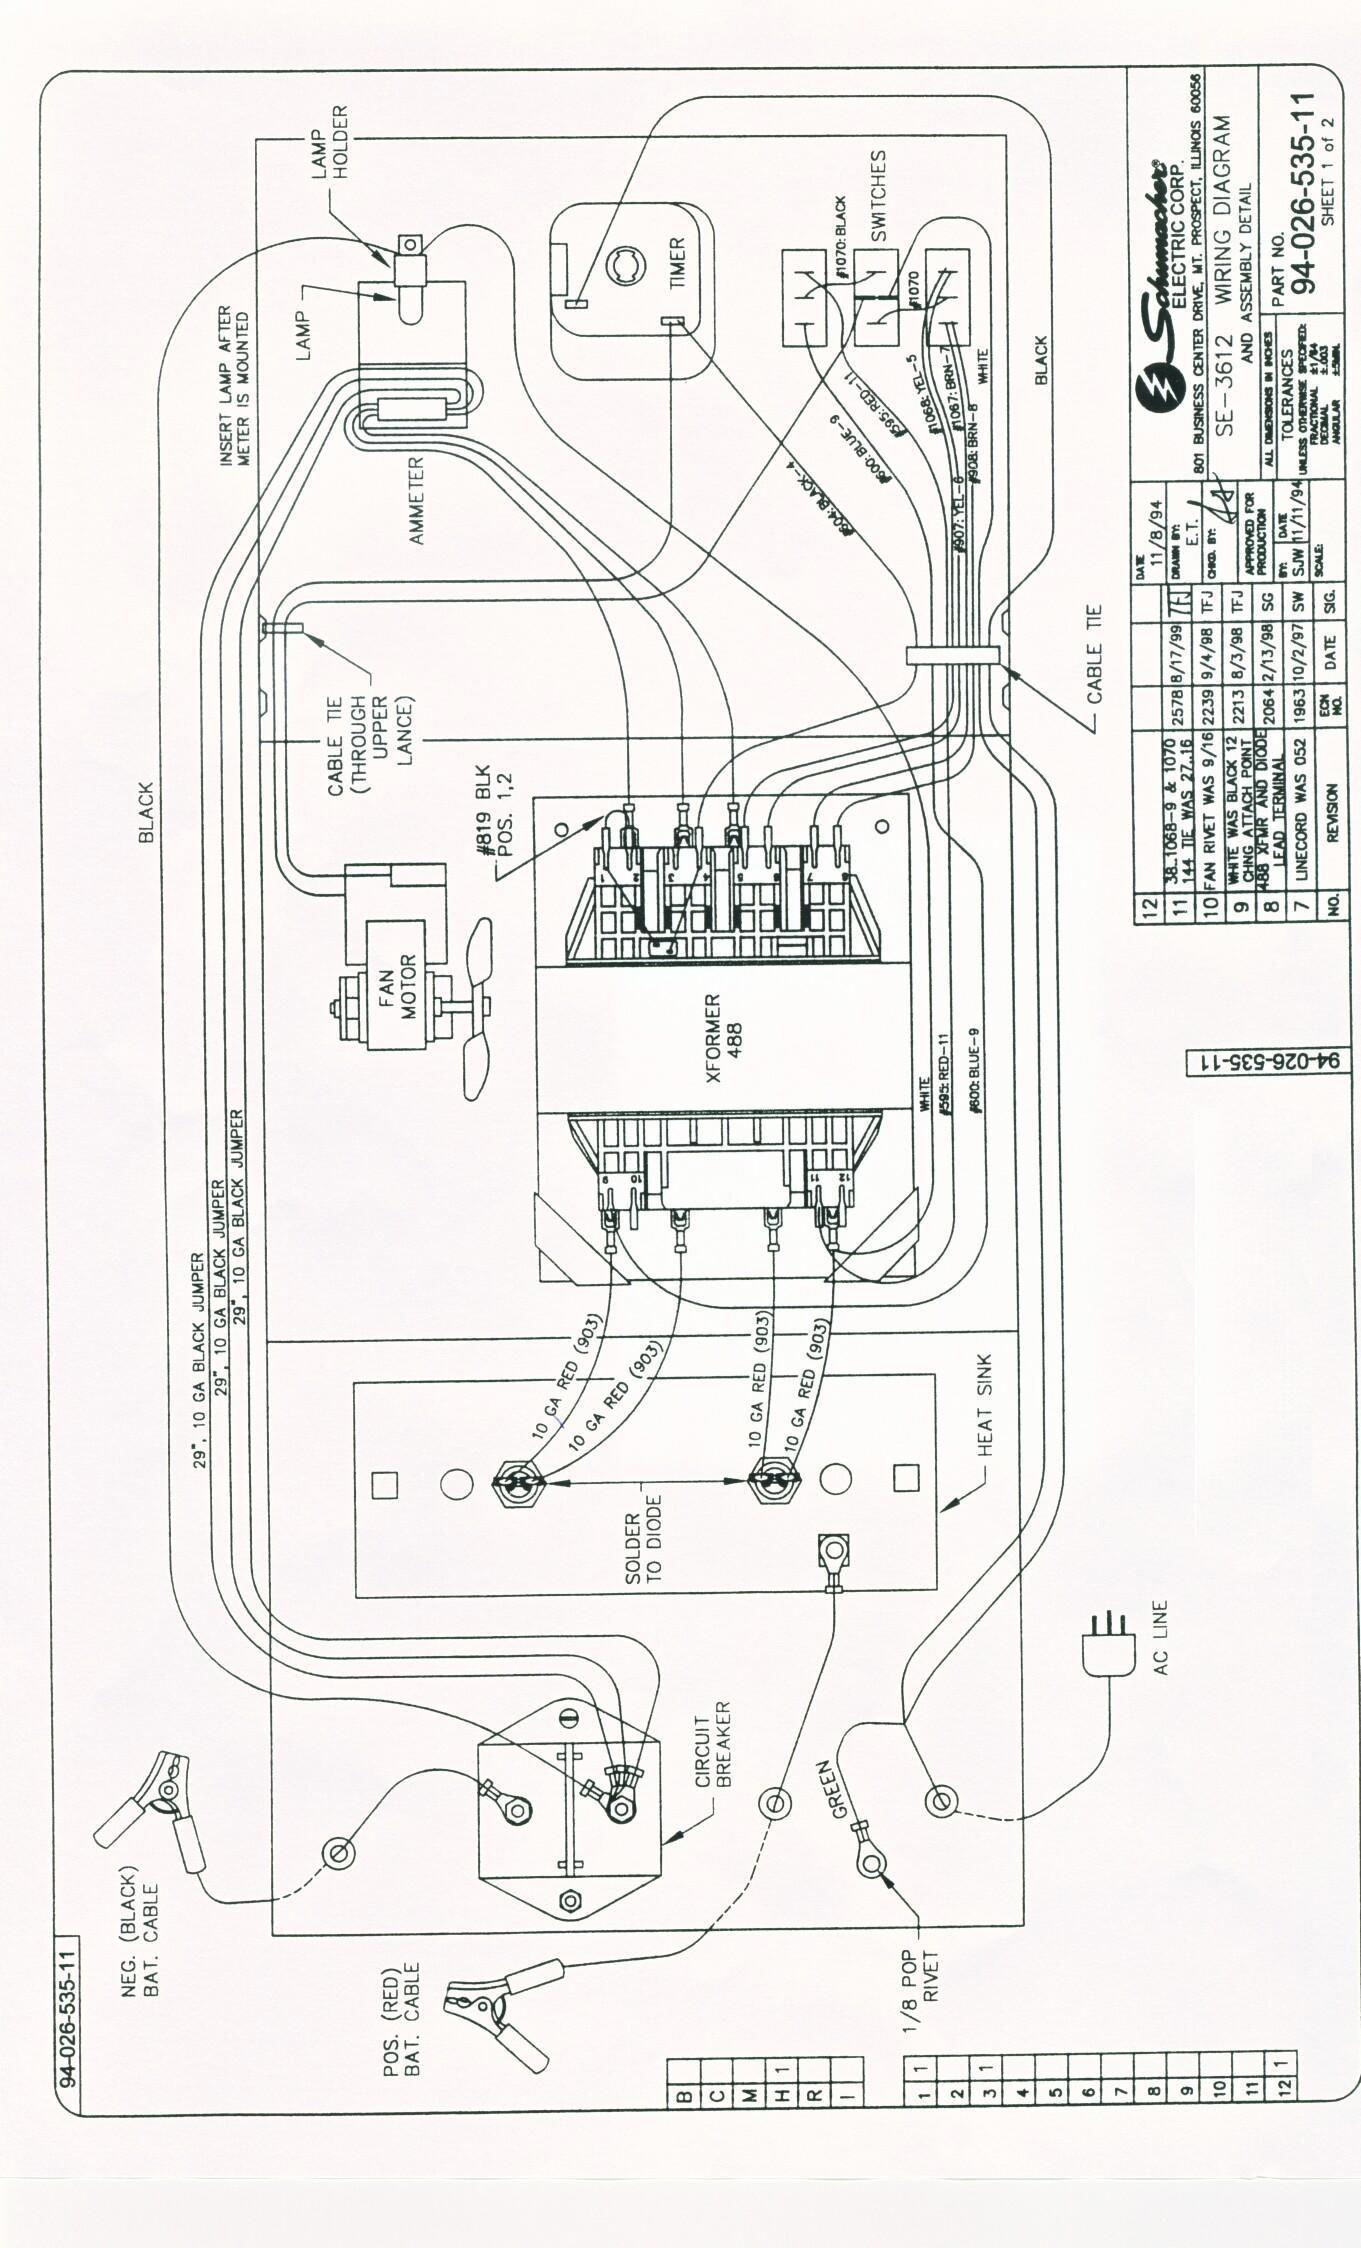 medium resolution of schumacher battery charger wiring schematic 0 car battery motors wiring diagram iphone 6 schematics schumacher battery charger wiring